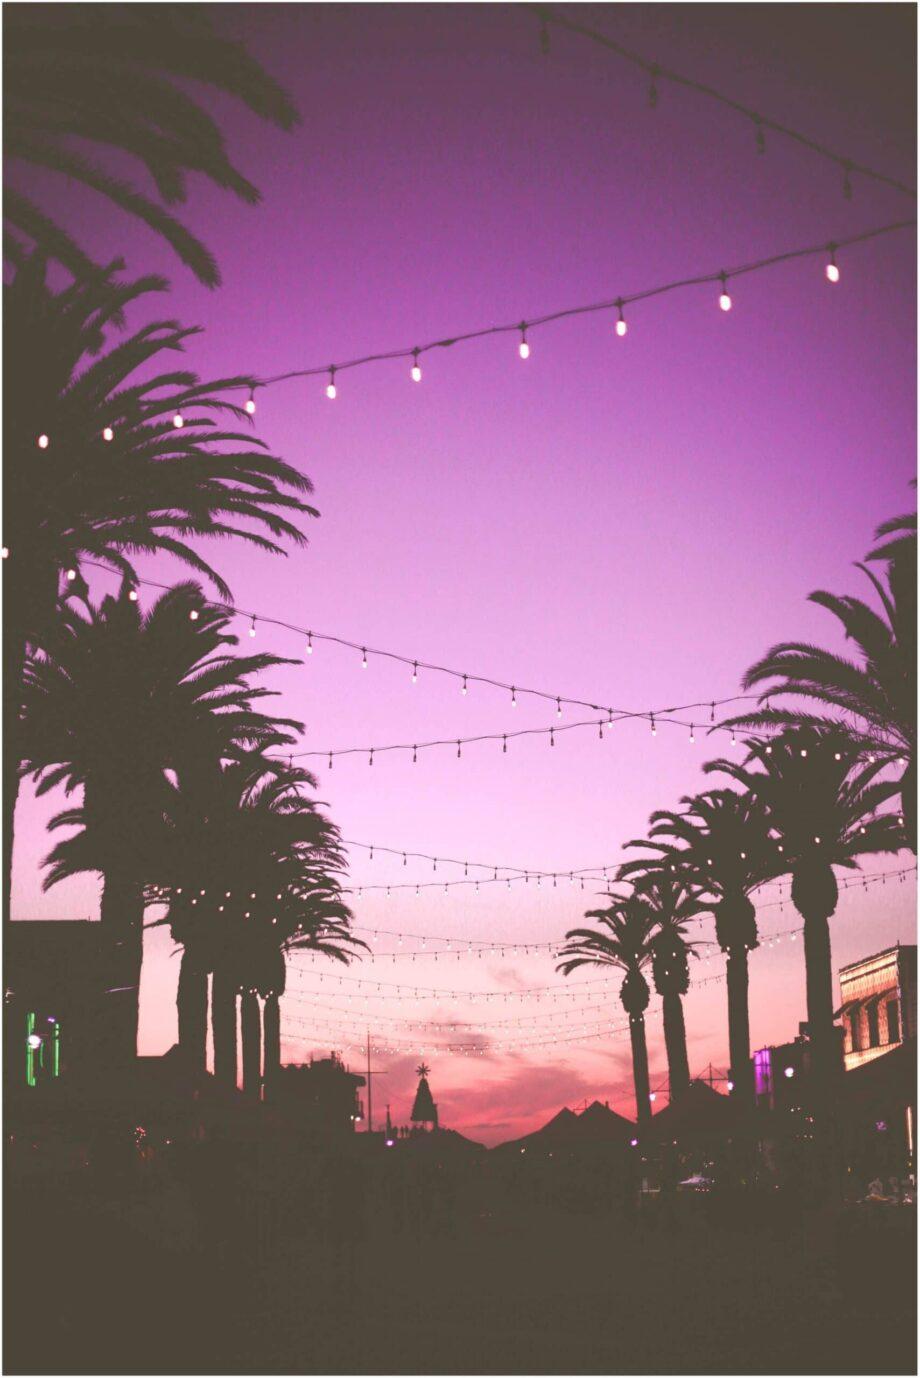 8946004323658_Marion Michelle_Miami Nights@0.5x-50